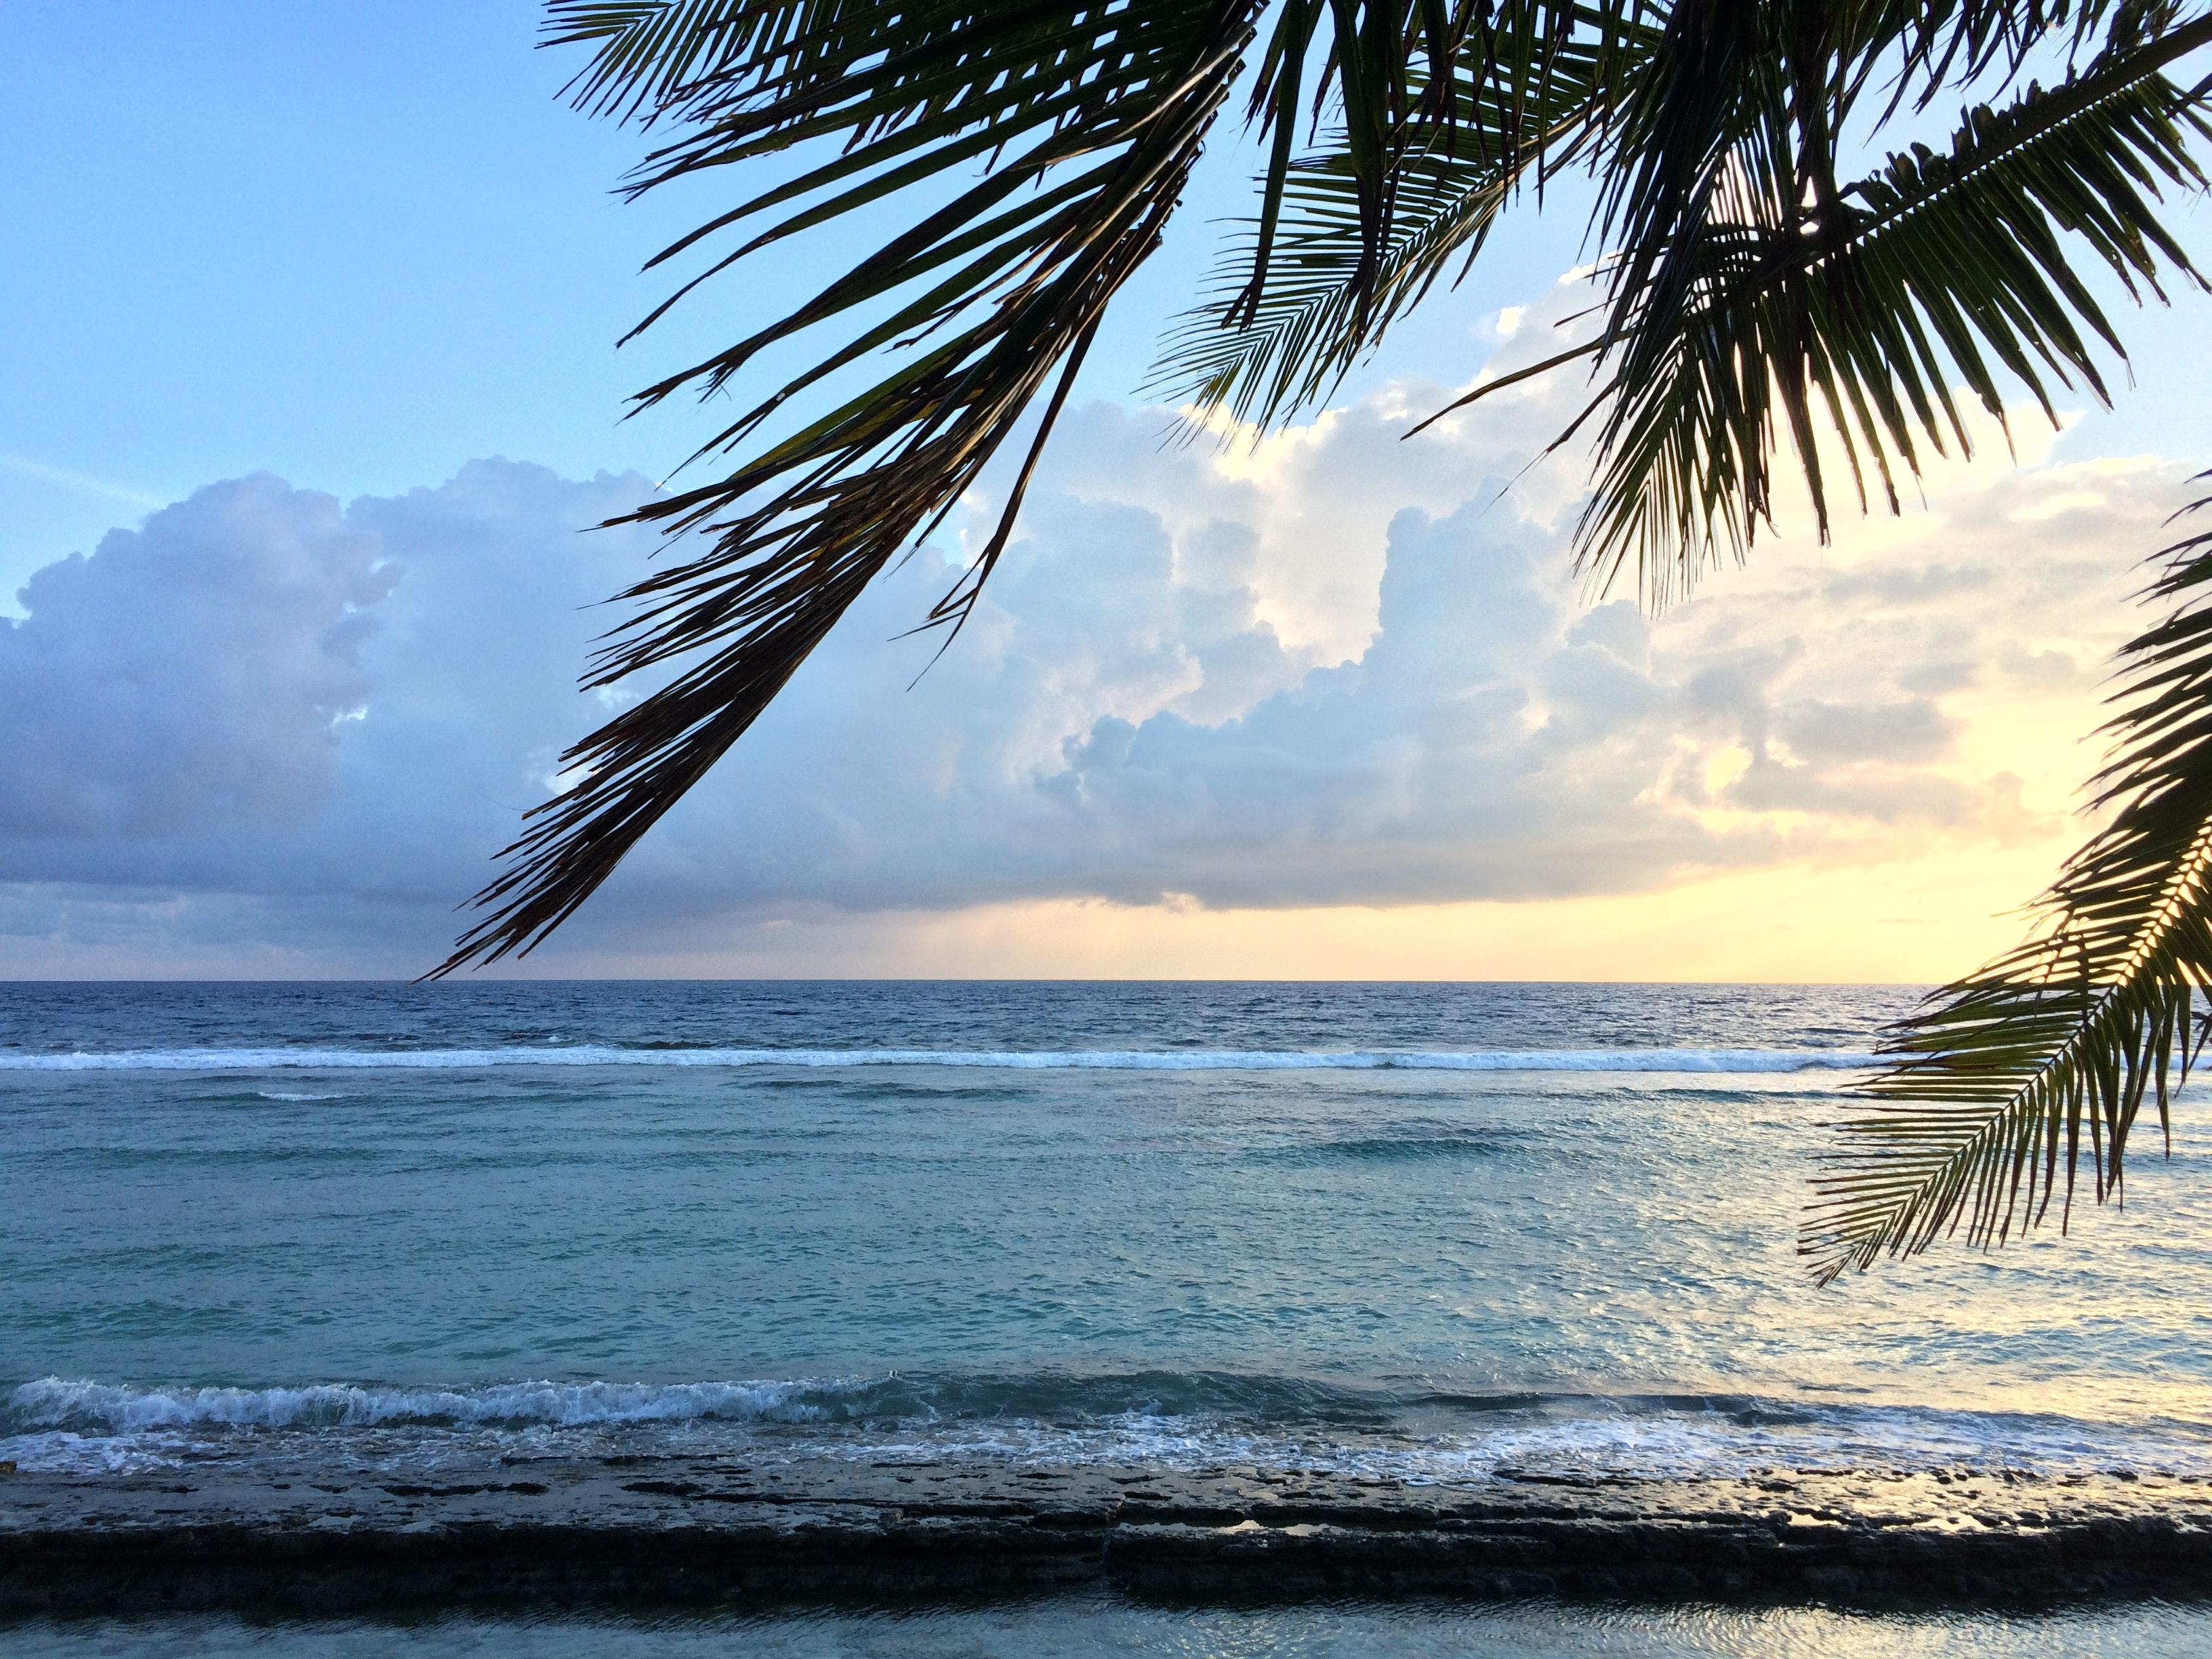 Free stock photo of beach front, coconut tree, coconut tree leaf in beach front